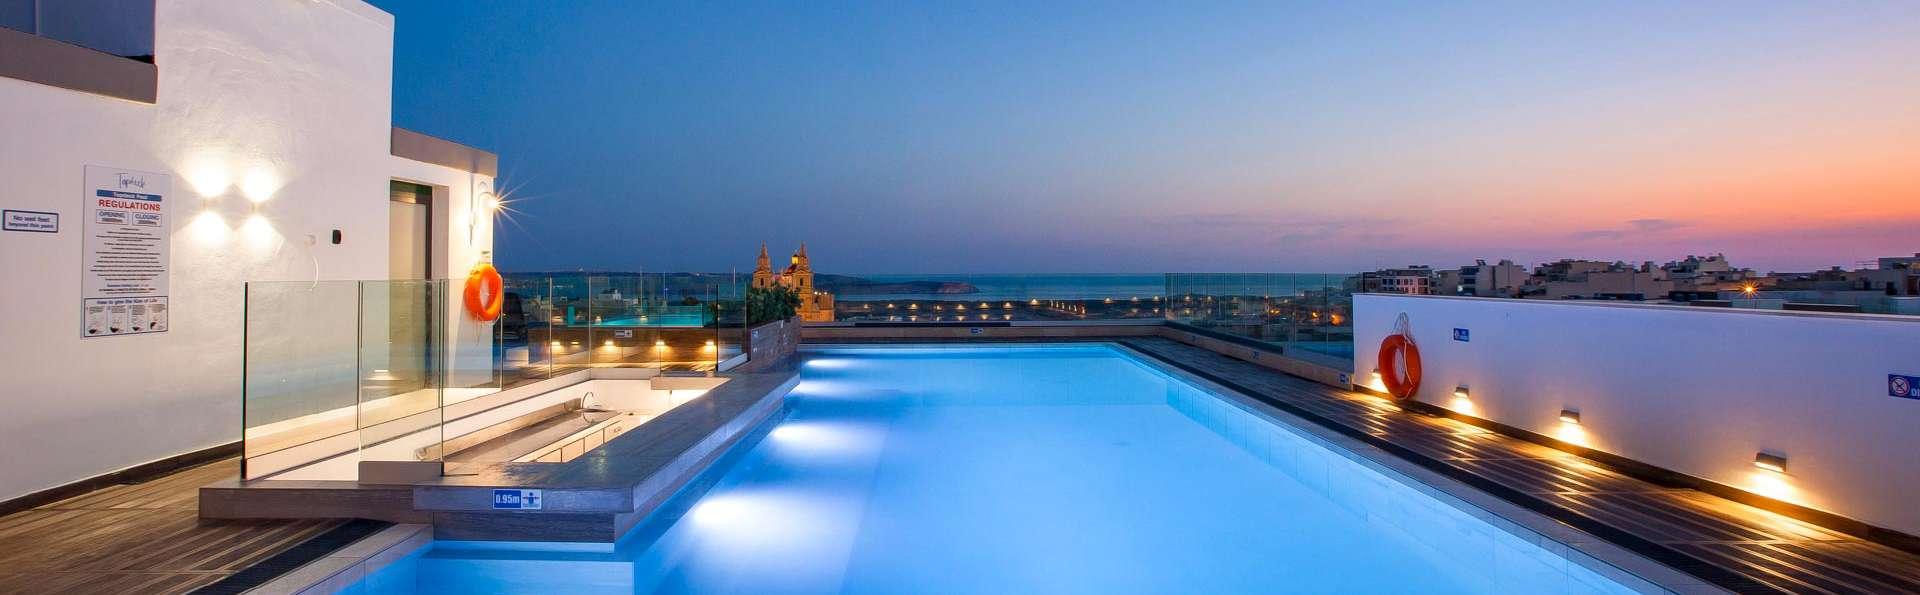 Solana Hotel and Spa - EDIT_POOL_06.jpg